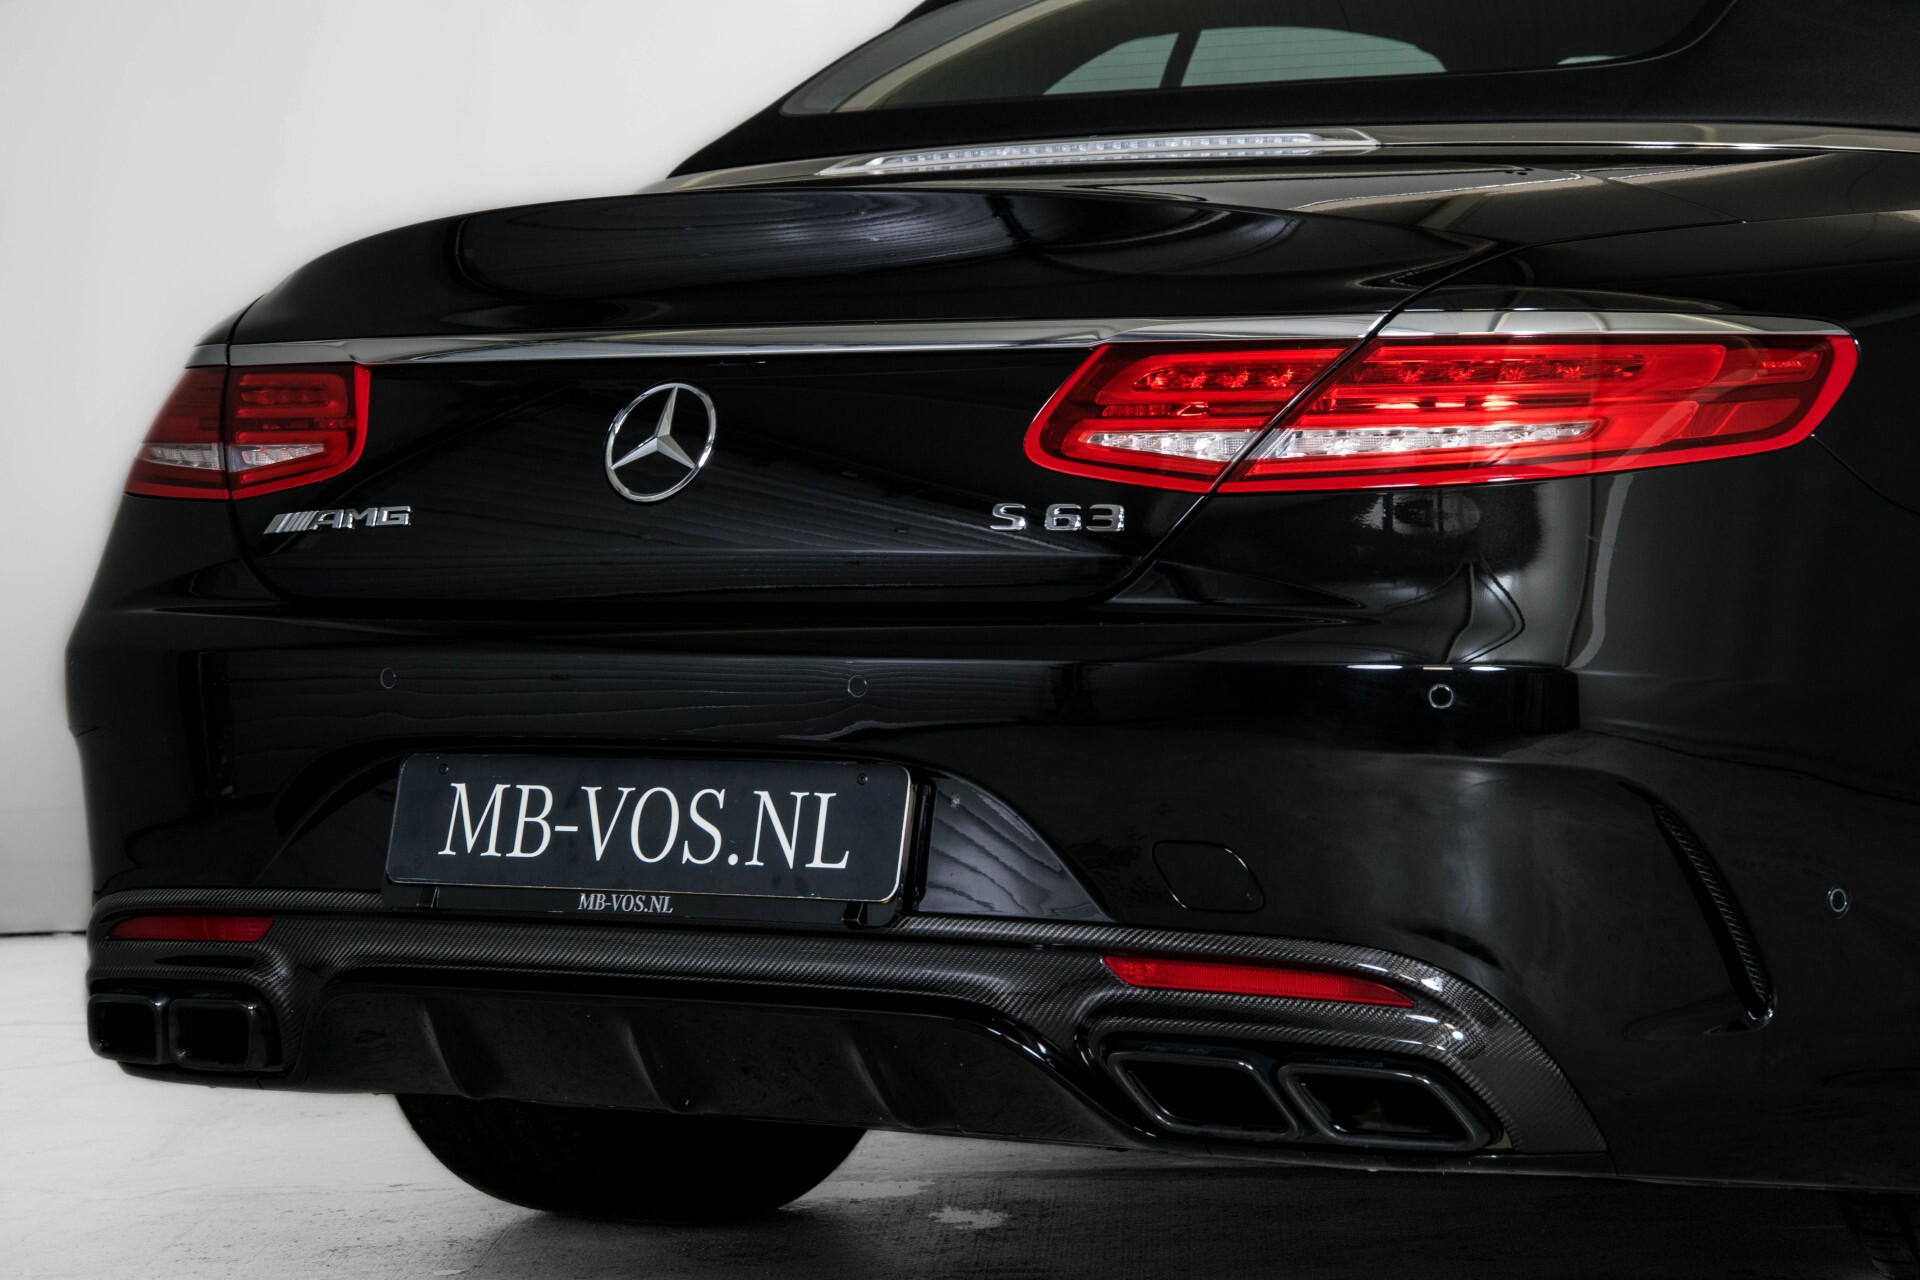 Mercedes-Benz S-Klasse Cabrio 63 AMG 4-M Ceramic/Designo/Carbon/Burmester High End Aut Foto 68